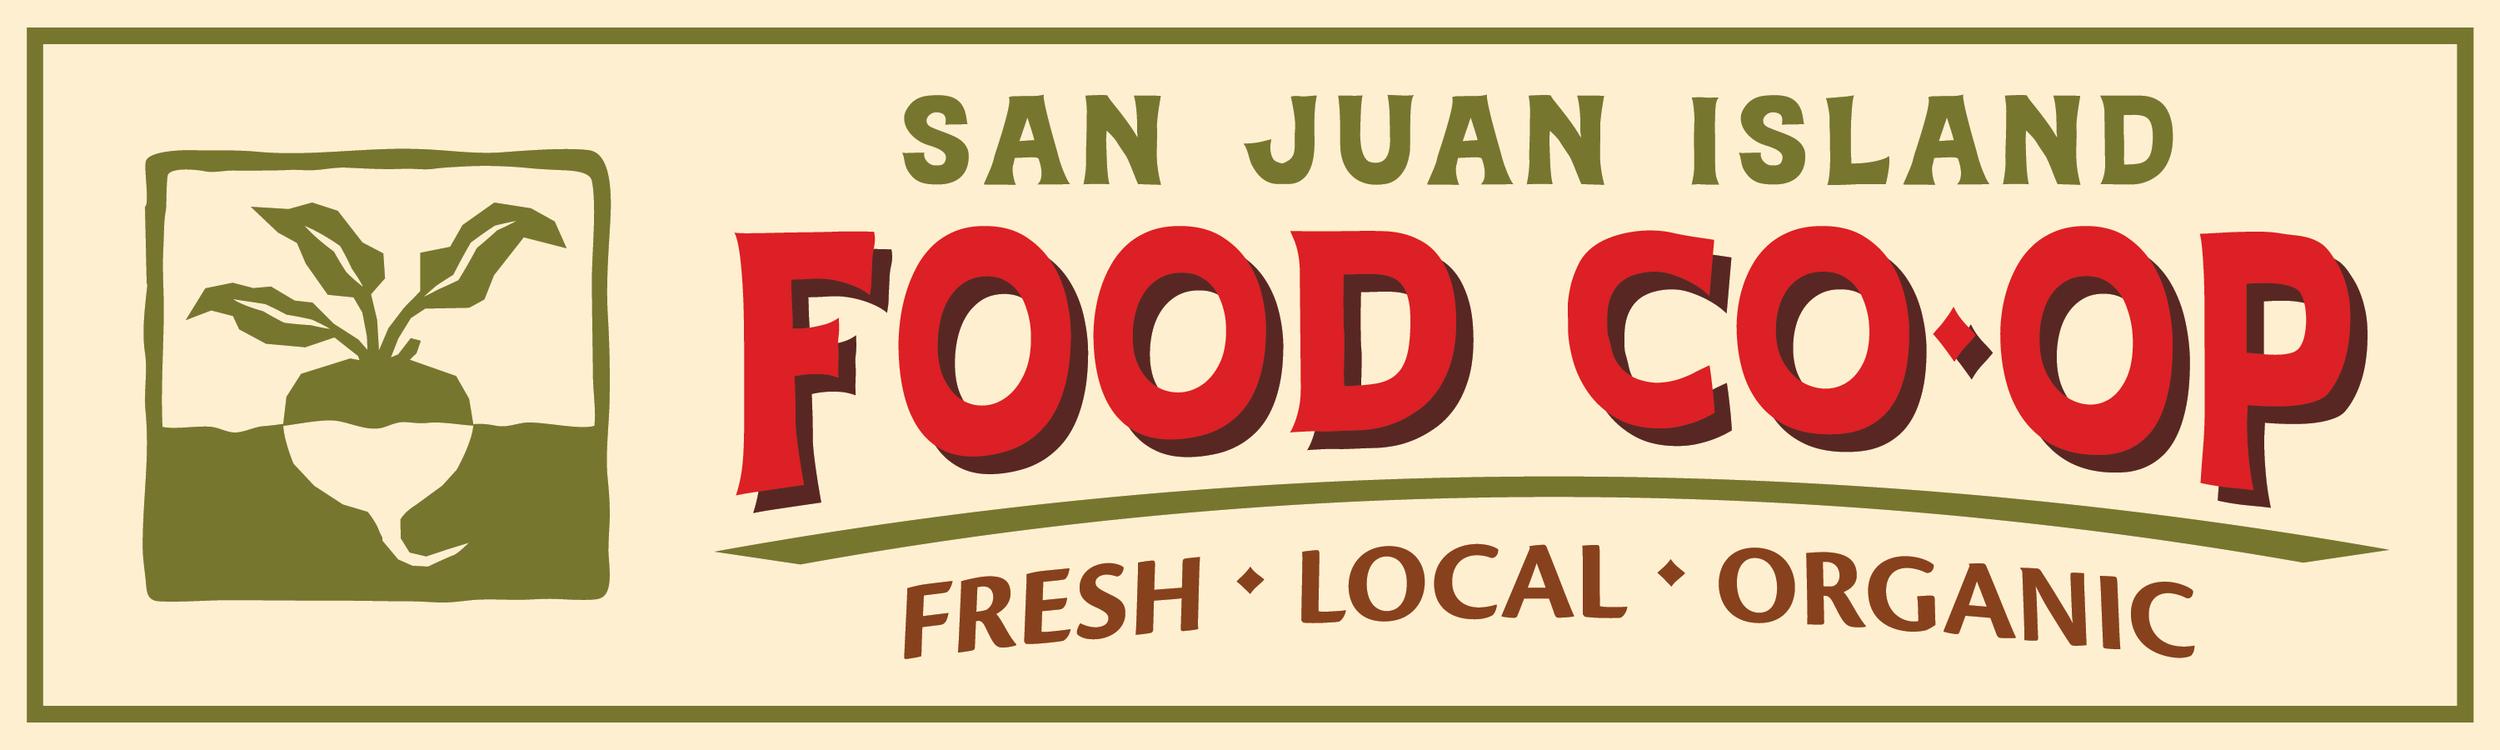 SAN JUAN ISLAND FOOD CO-OP (bumper sticker)